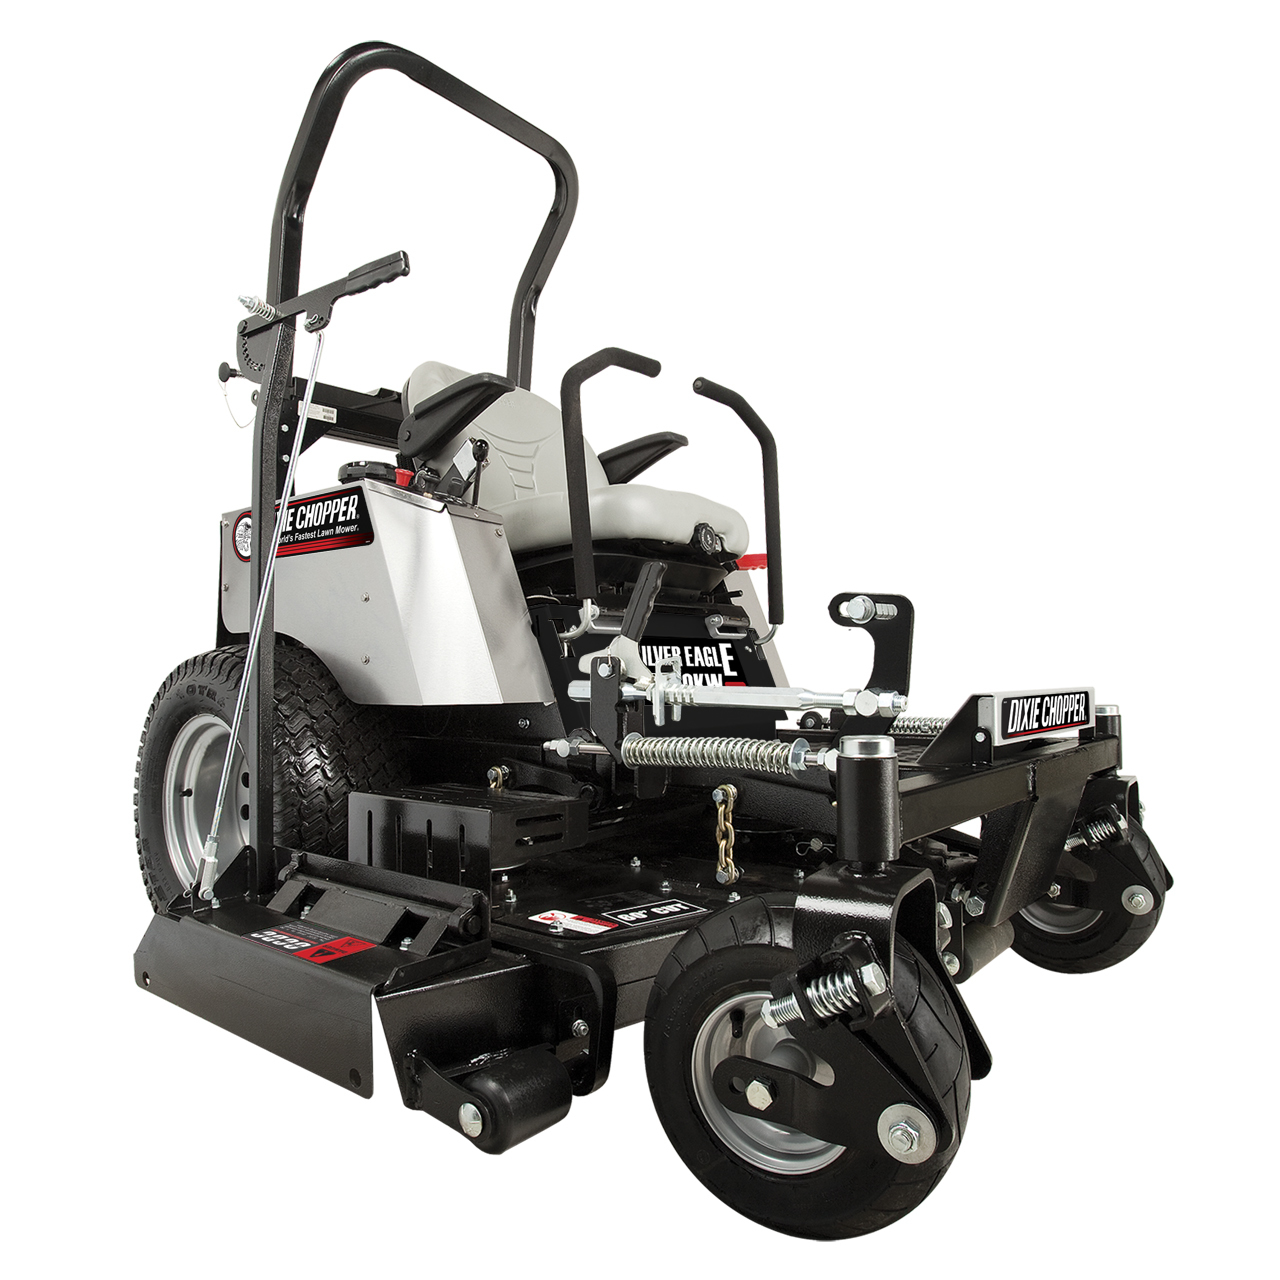 New Dixie Chopper Zero Turn Lawn Mowers, Parts and Repair